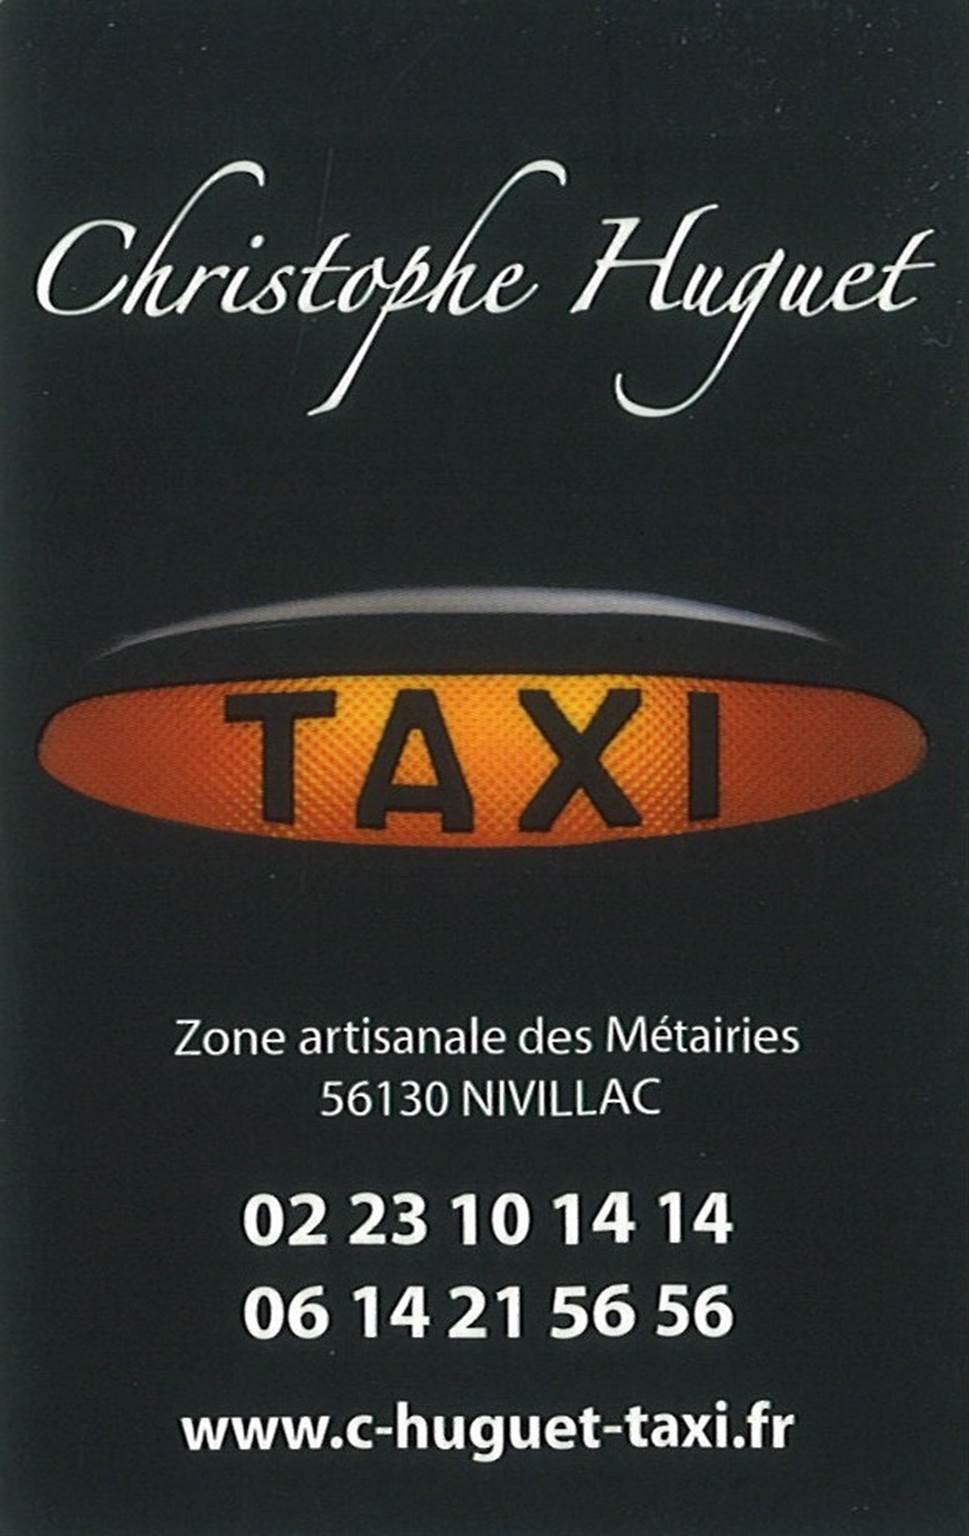 Taxi Christophe Huguet